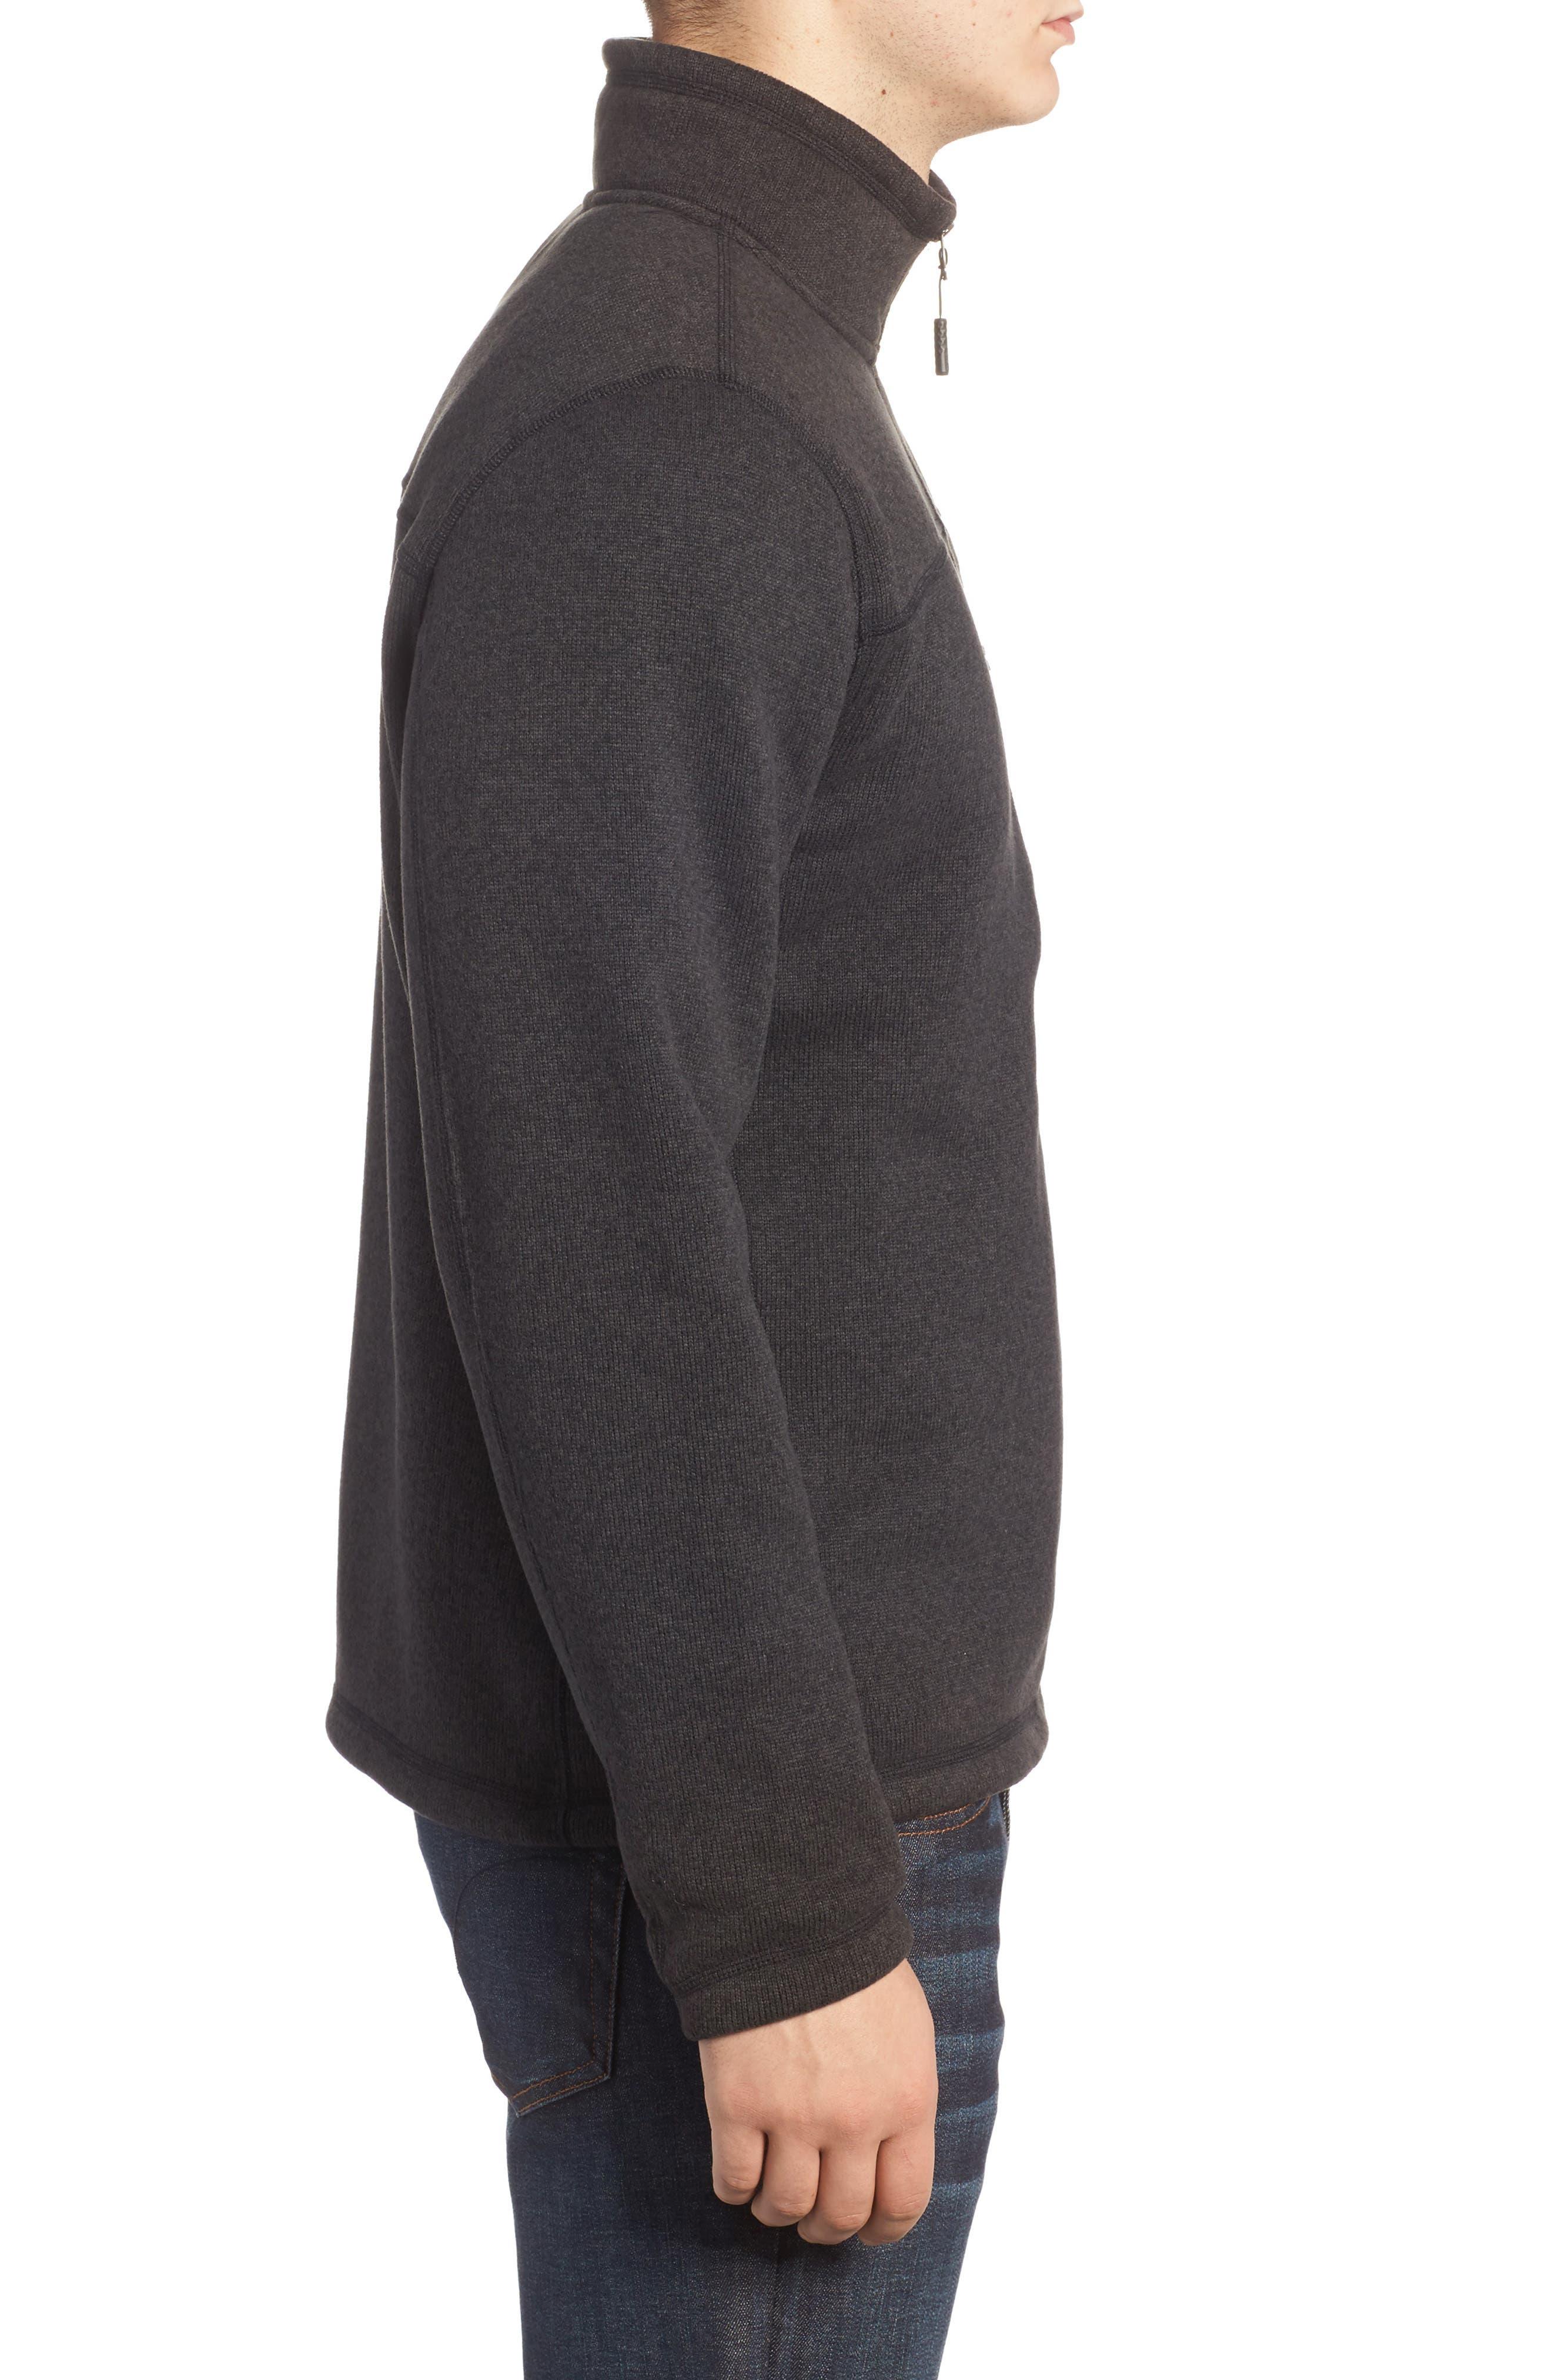 Gordon Lyons Quarter-Zip Fleece Jacket,                             Alternate thumbnail 3, color,                             BLACK HEATHER